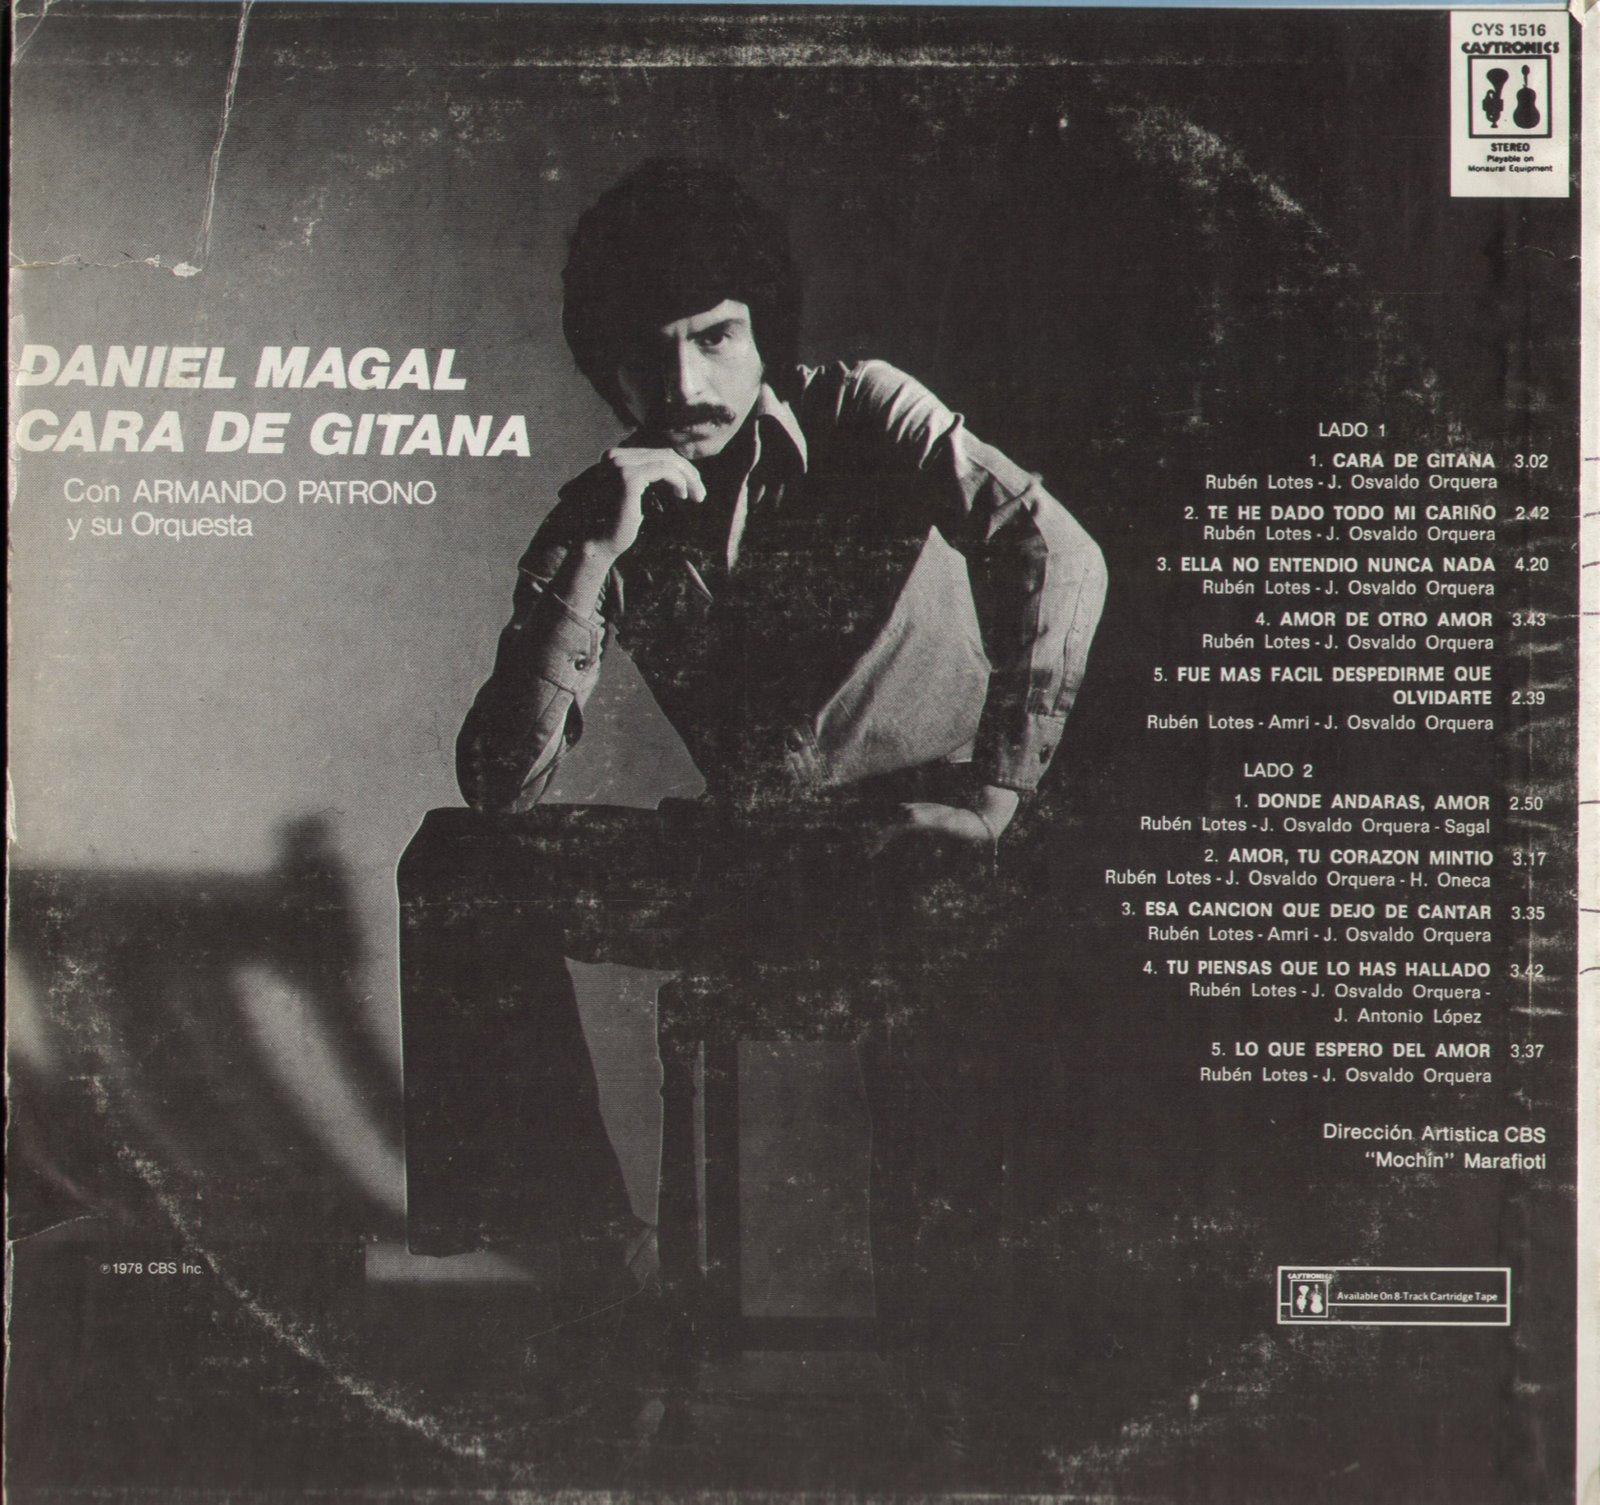 Daniel Magal Cara De Gitana